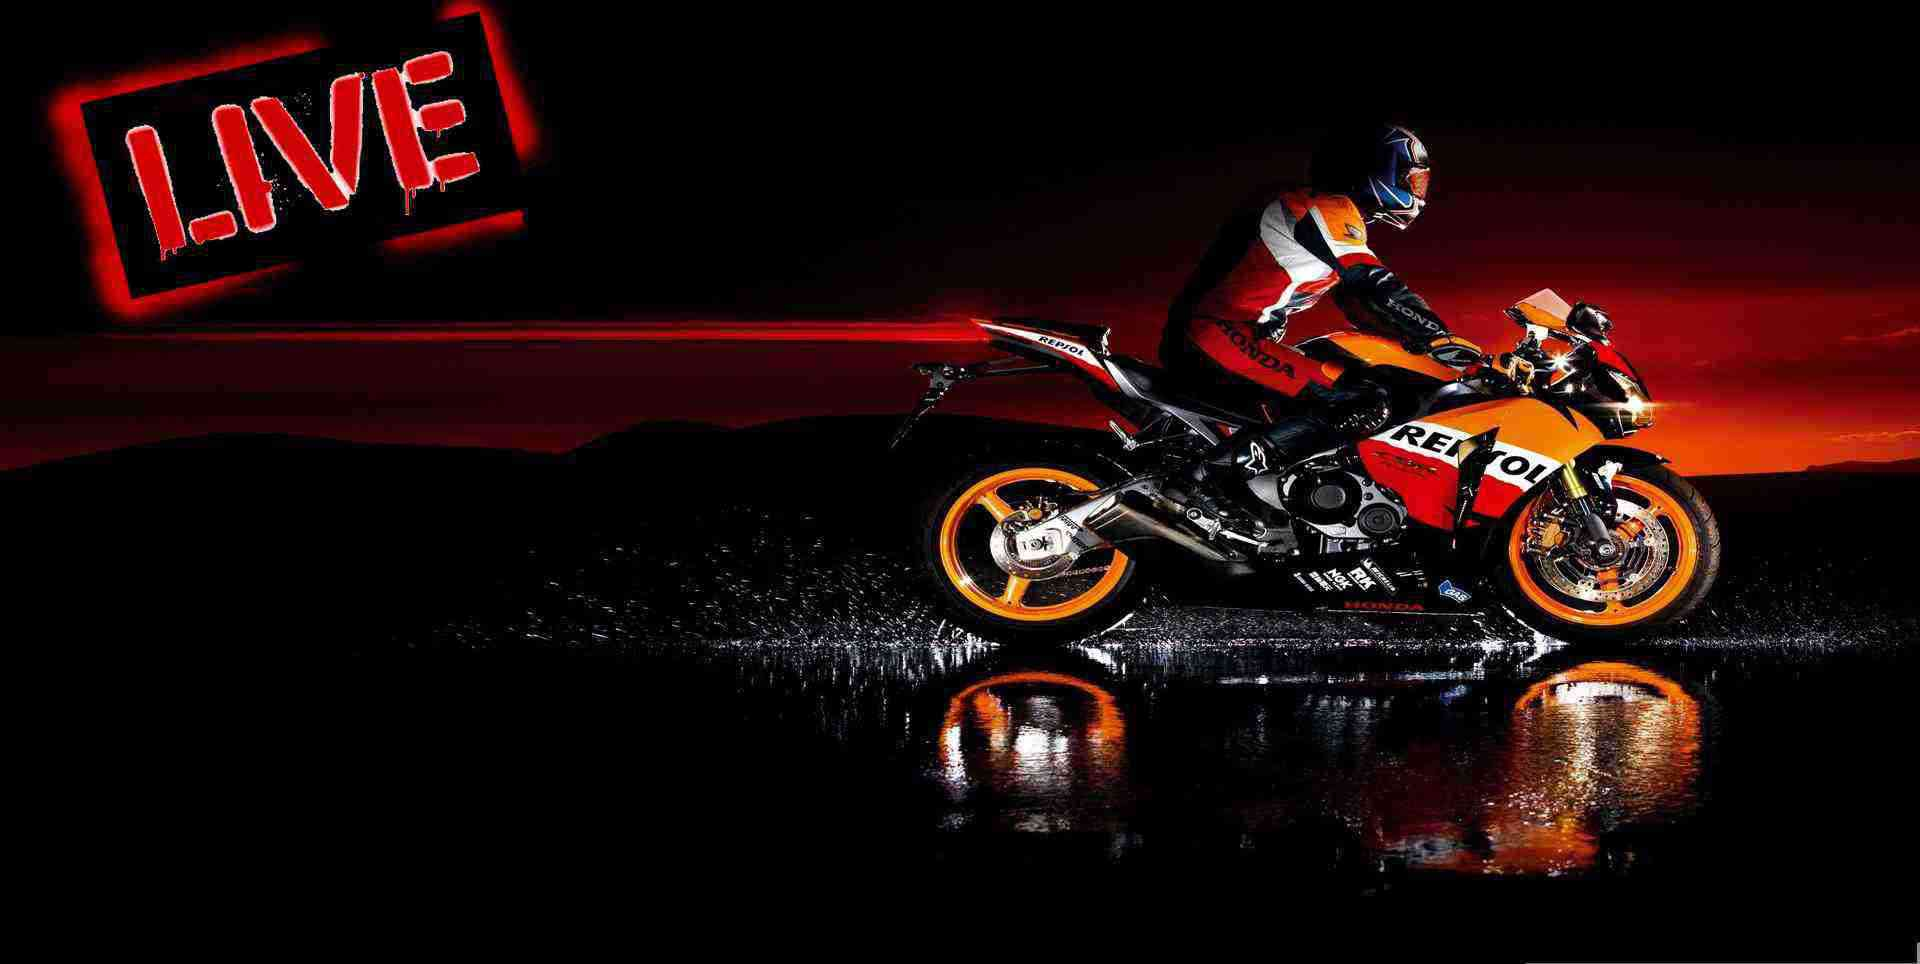 Watch Motogp Grand Prix Of Italy 2015 Live